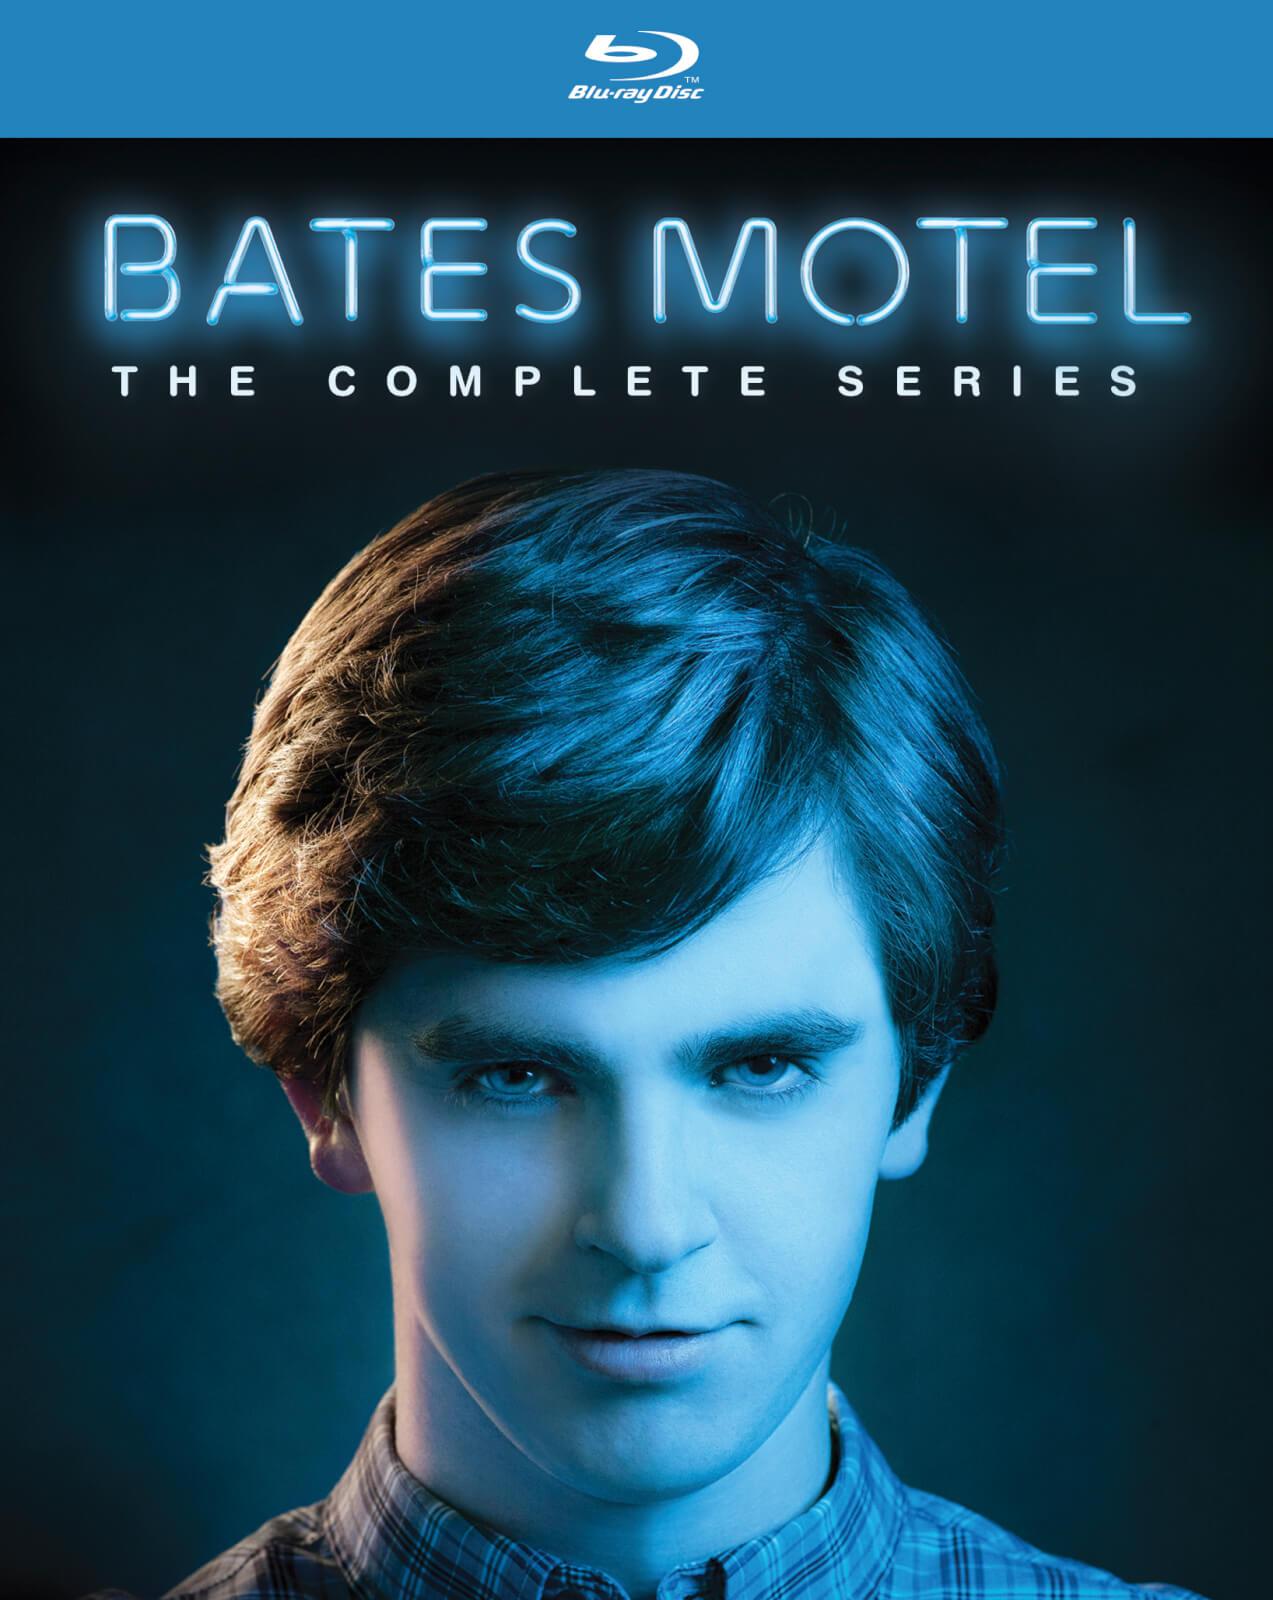 Bates Motel - The Complete Series Blu-Ray Boxset £18.99 @ Amazon UK (+£2.99 Non-prime)